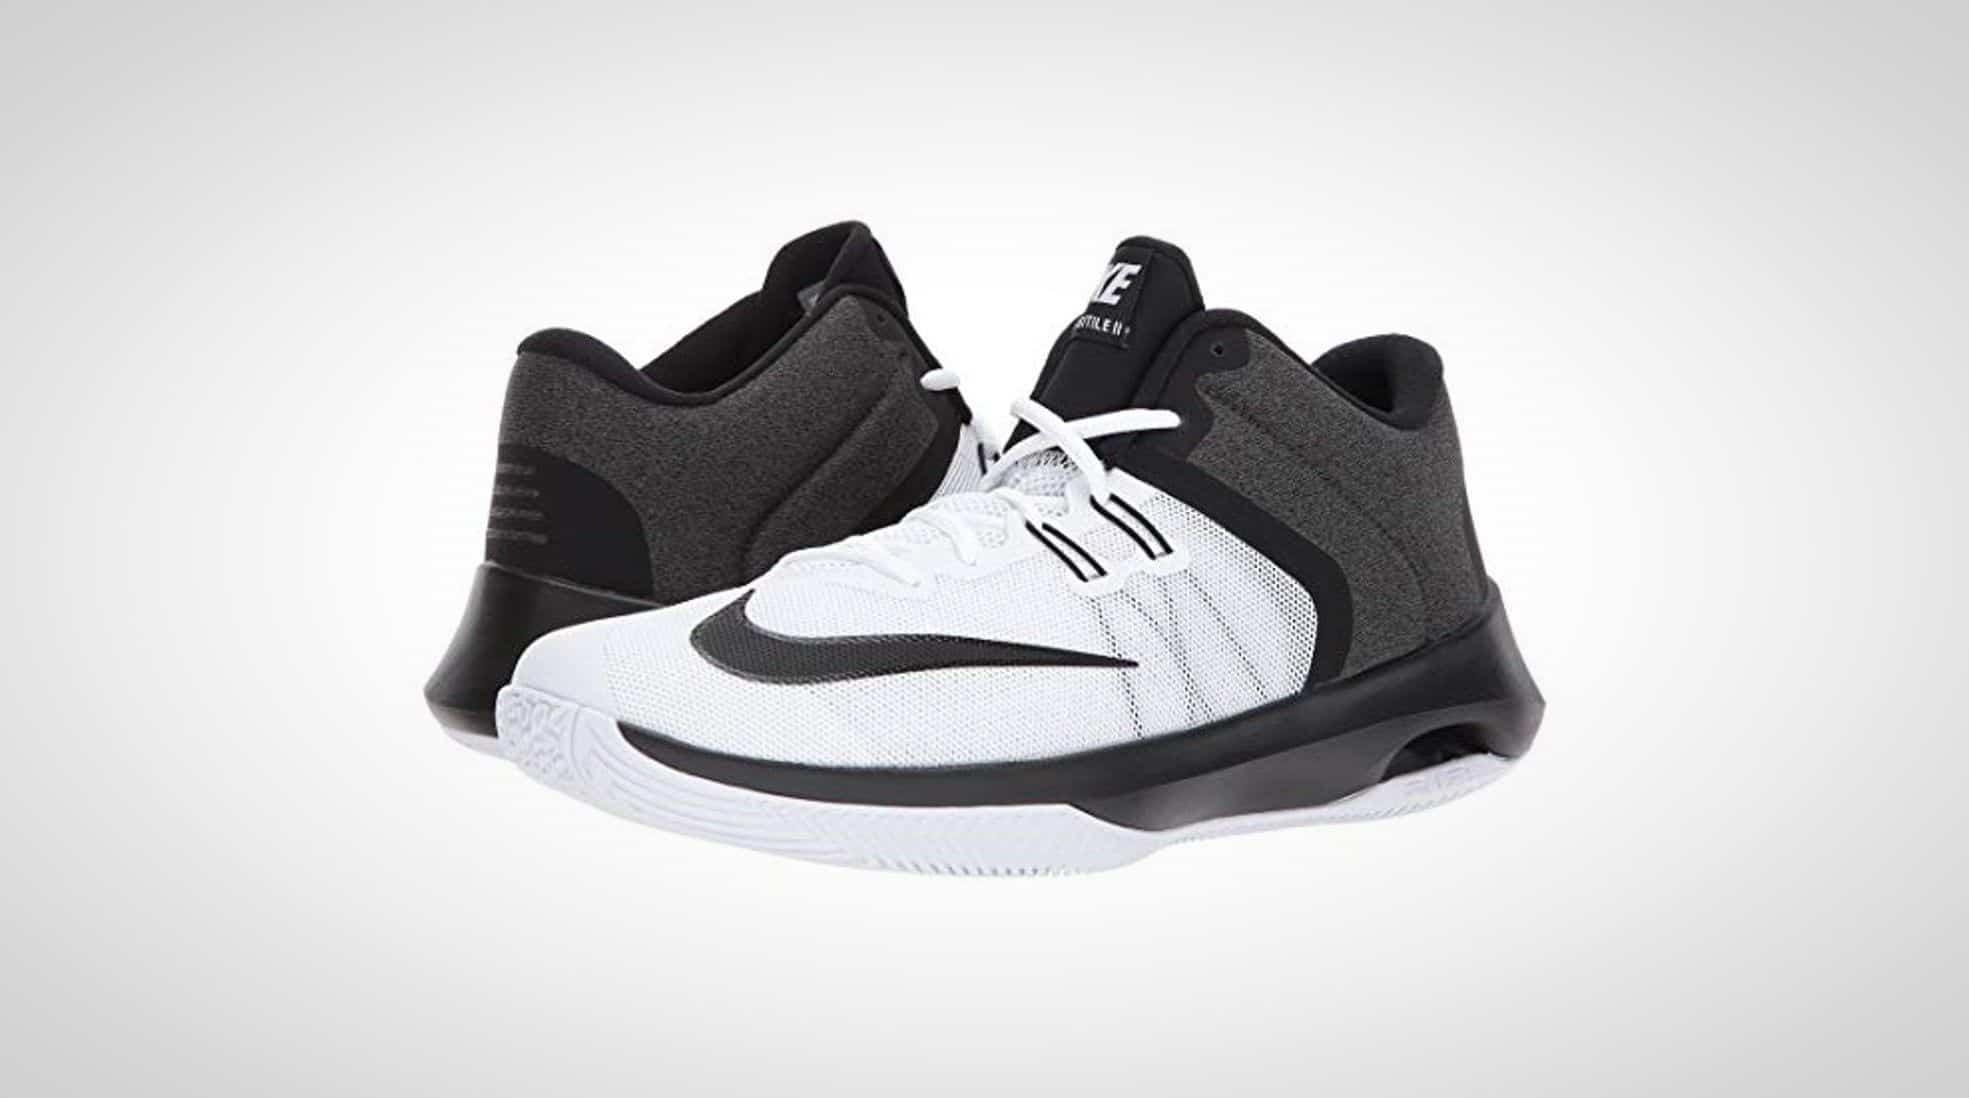 1f90dcdc13aa Nike Men s Air Versitile II Shoe Review - BestOutdoorBasketball